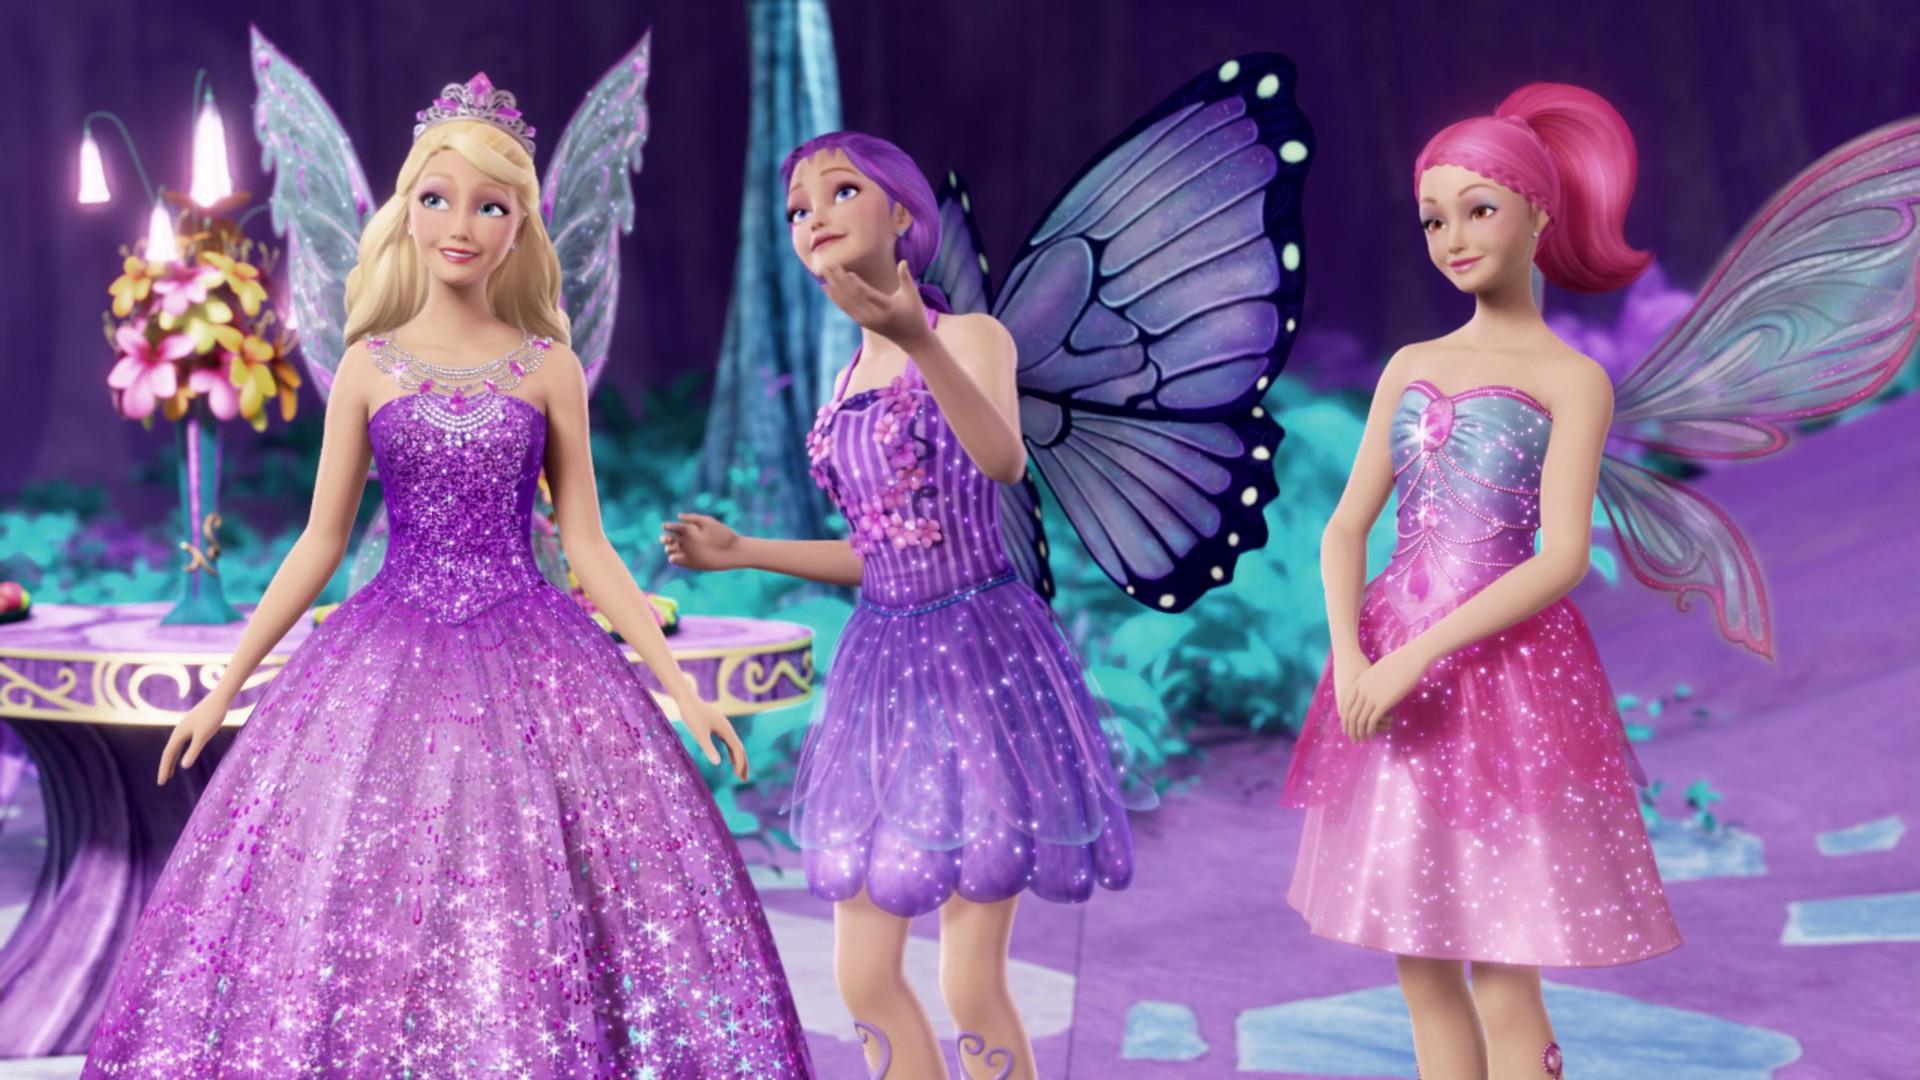 Barbie Wallpaper 73 Images